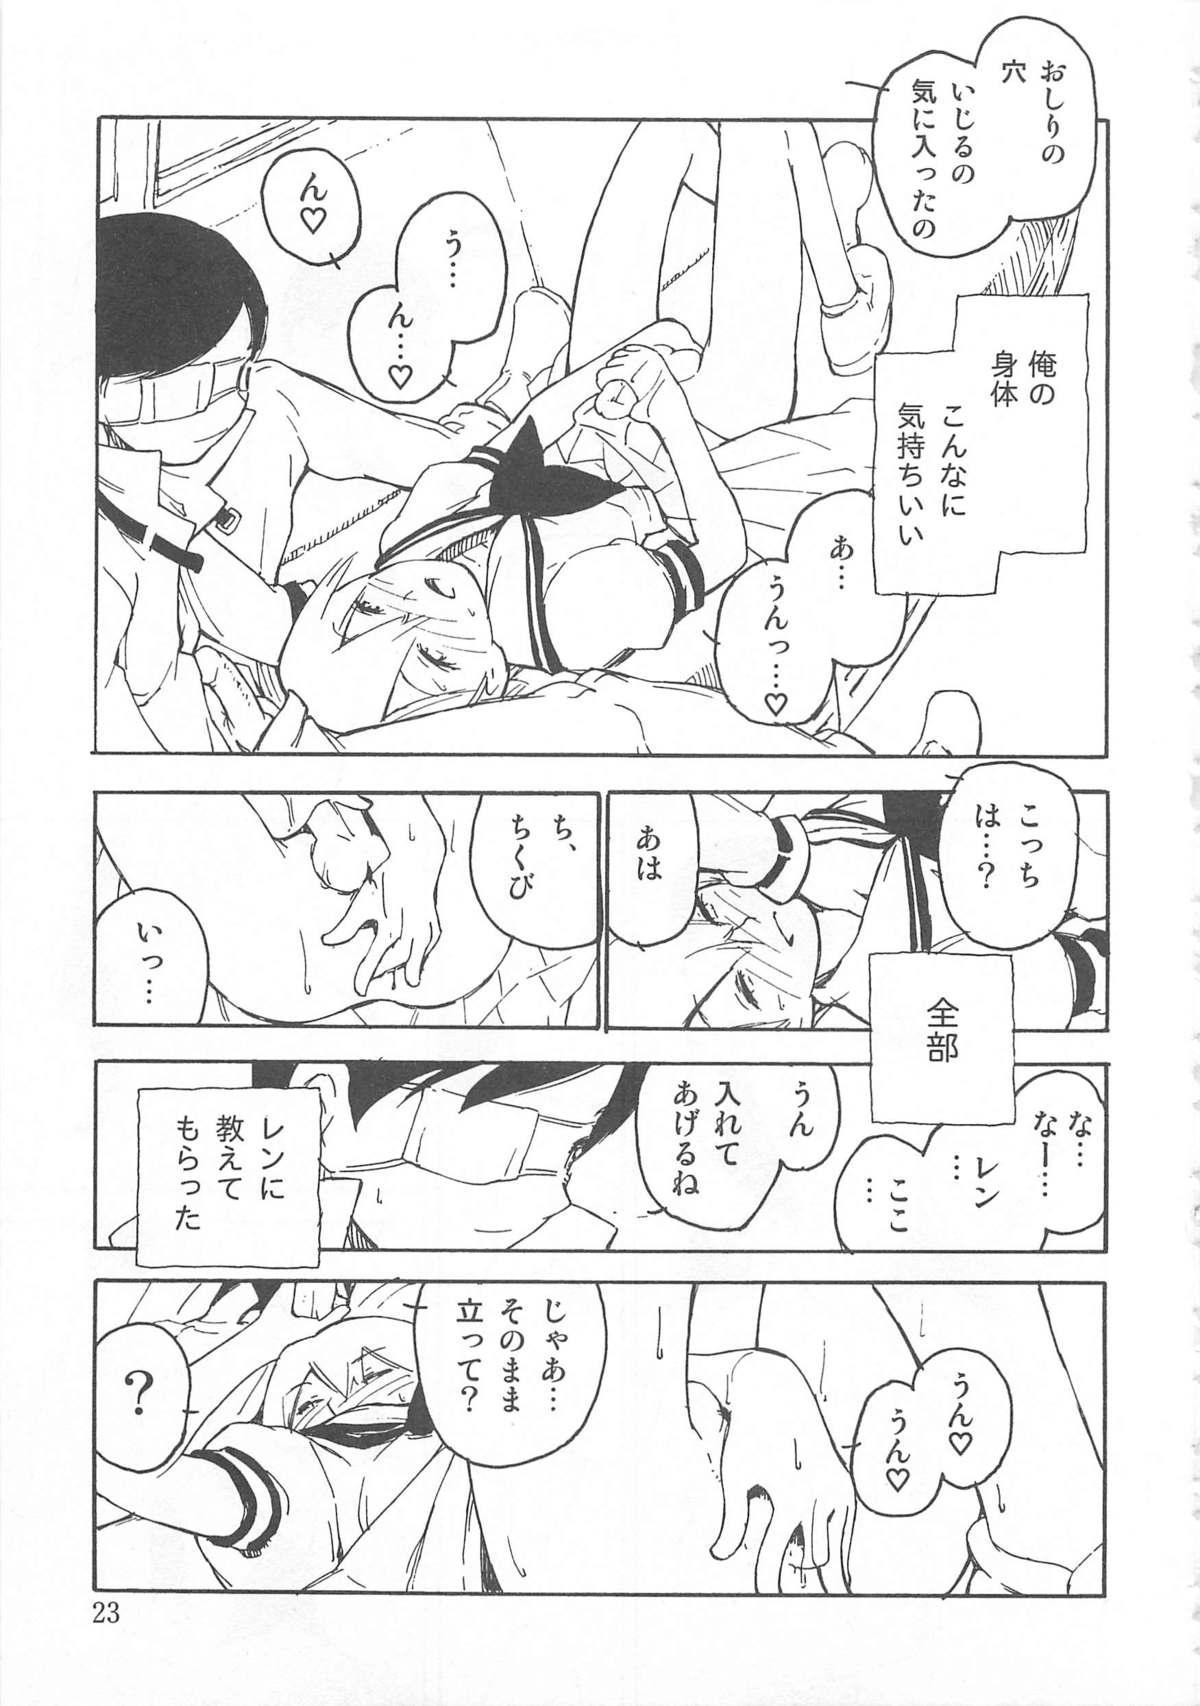 Otokonoko HEAVEN Vol. 02 Dokidoki Chikan Taiken 25